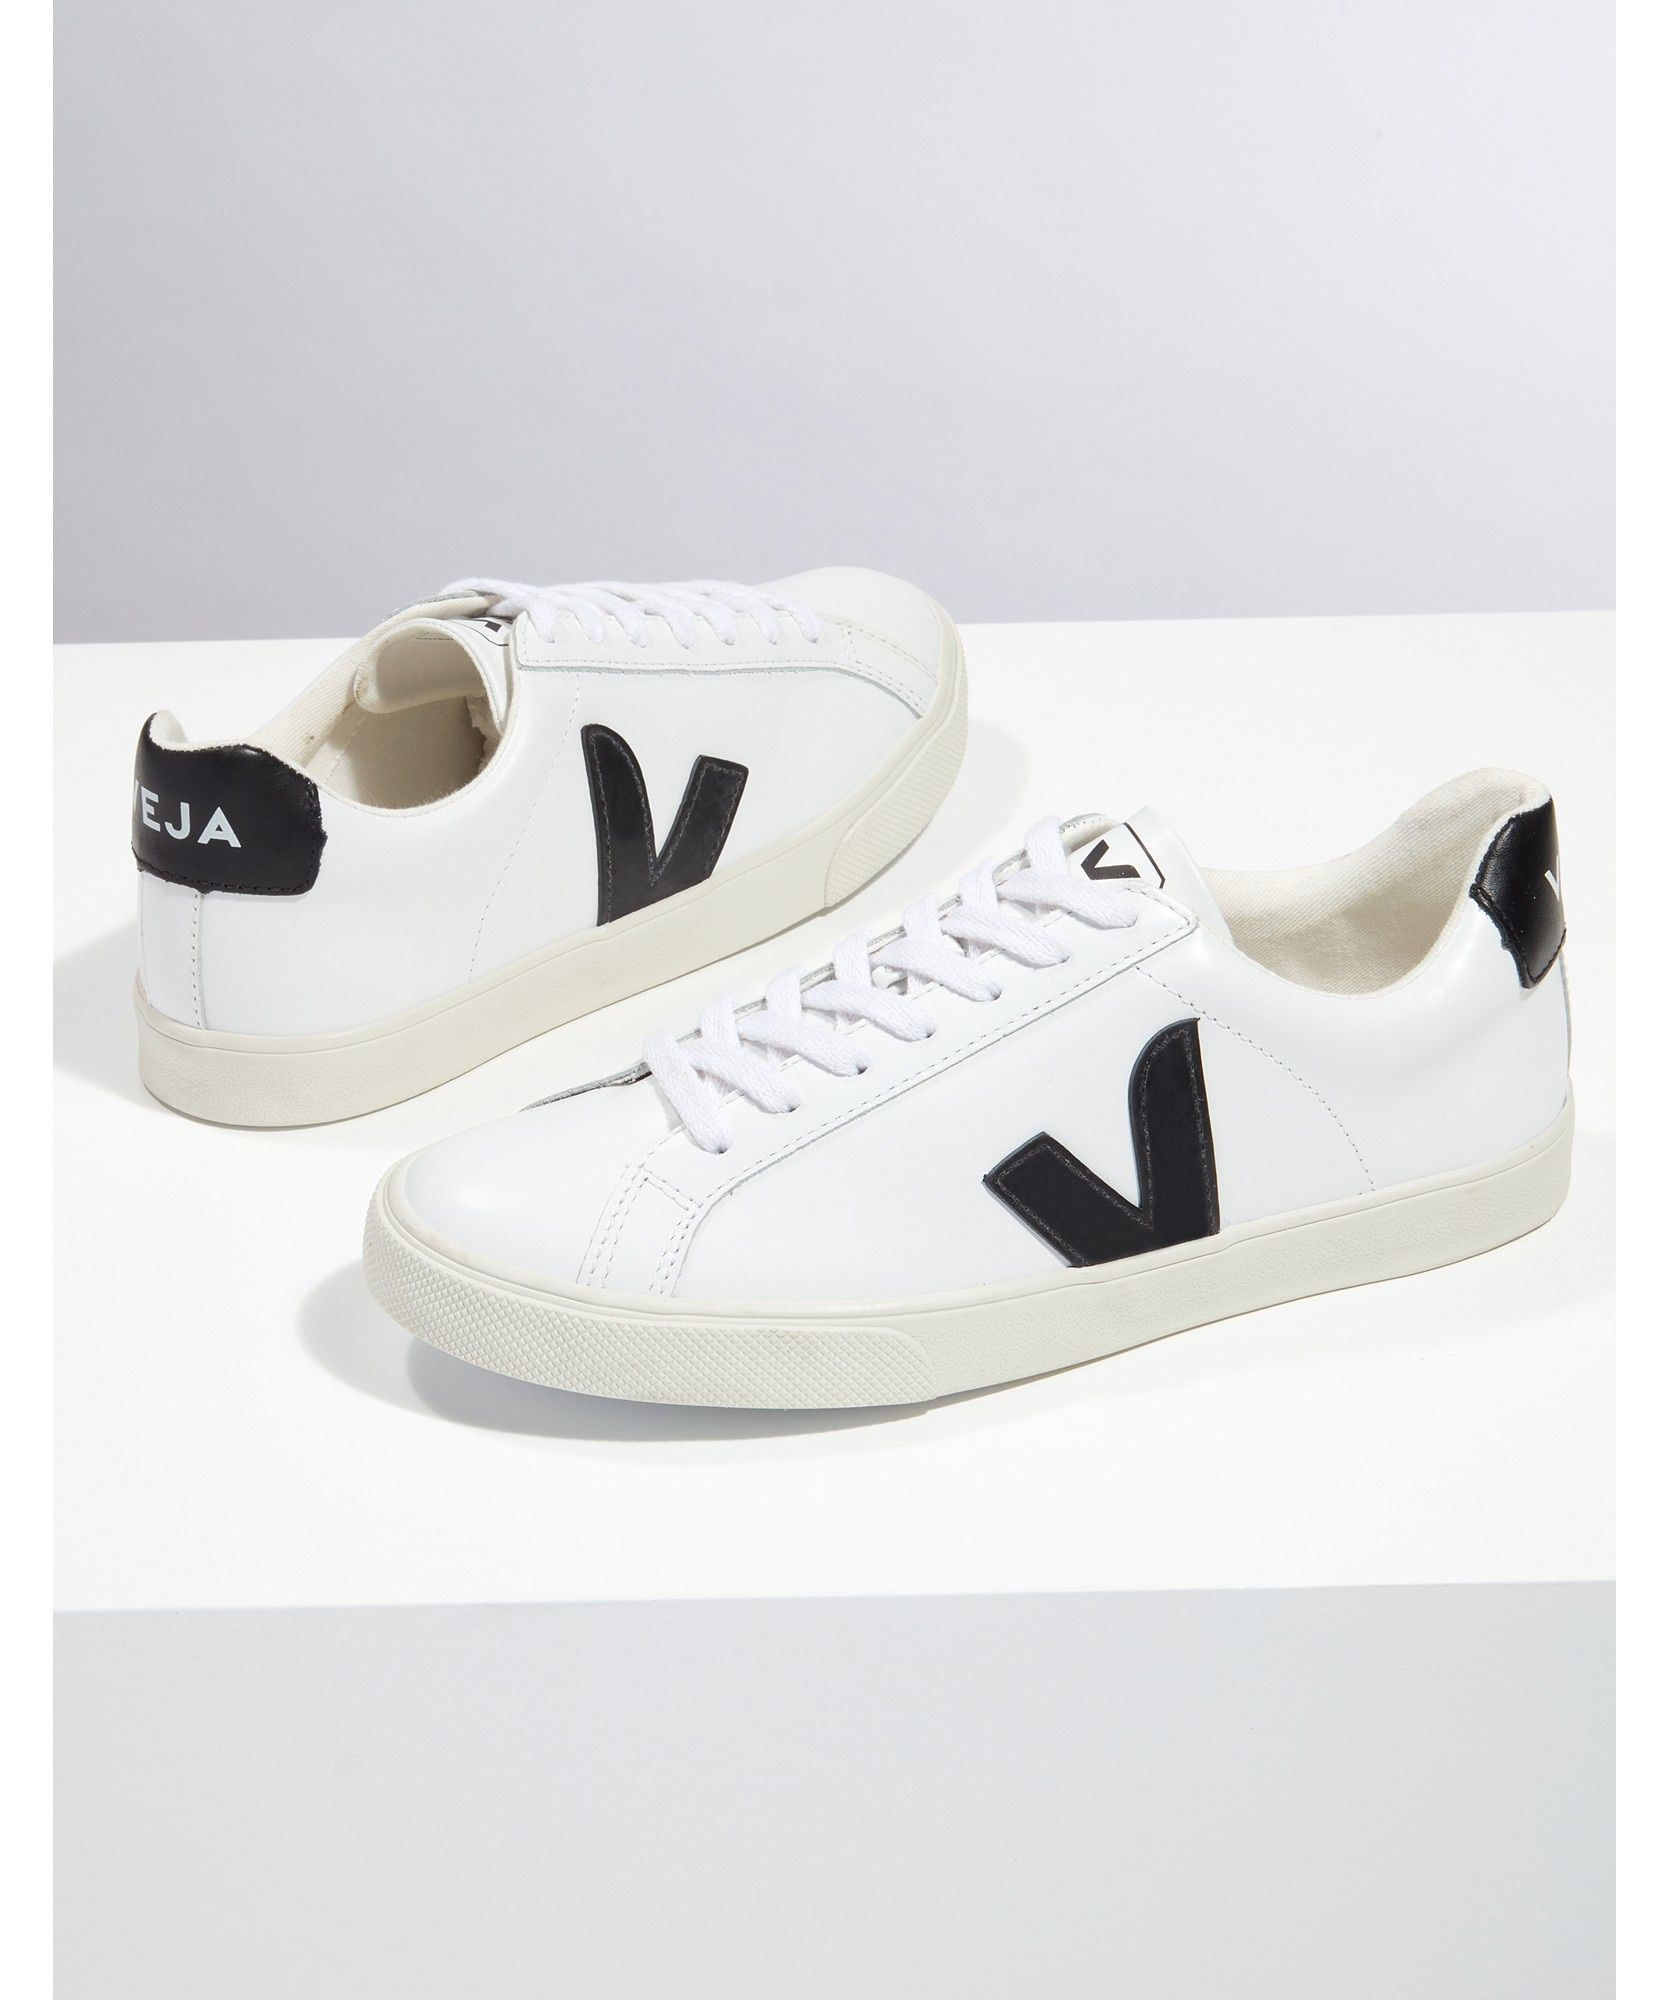 Veja Esplar Leather Trainers   Shoes